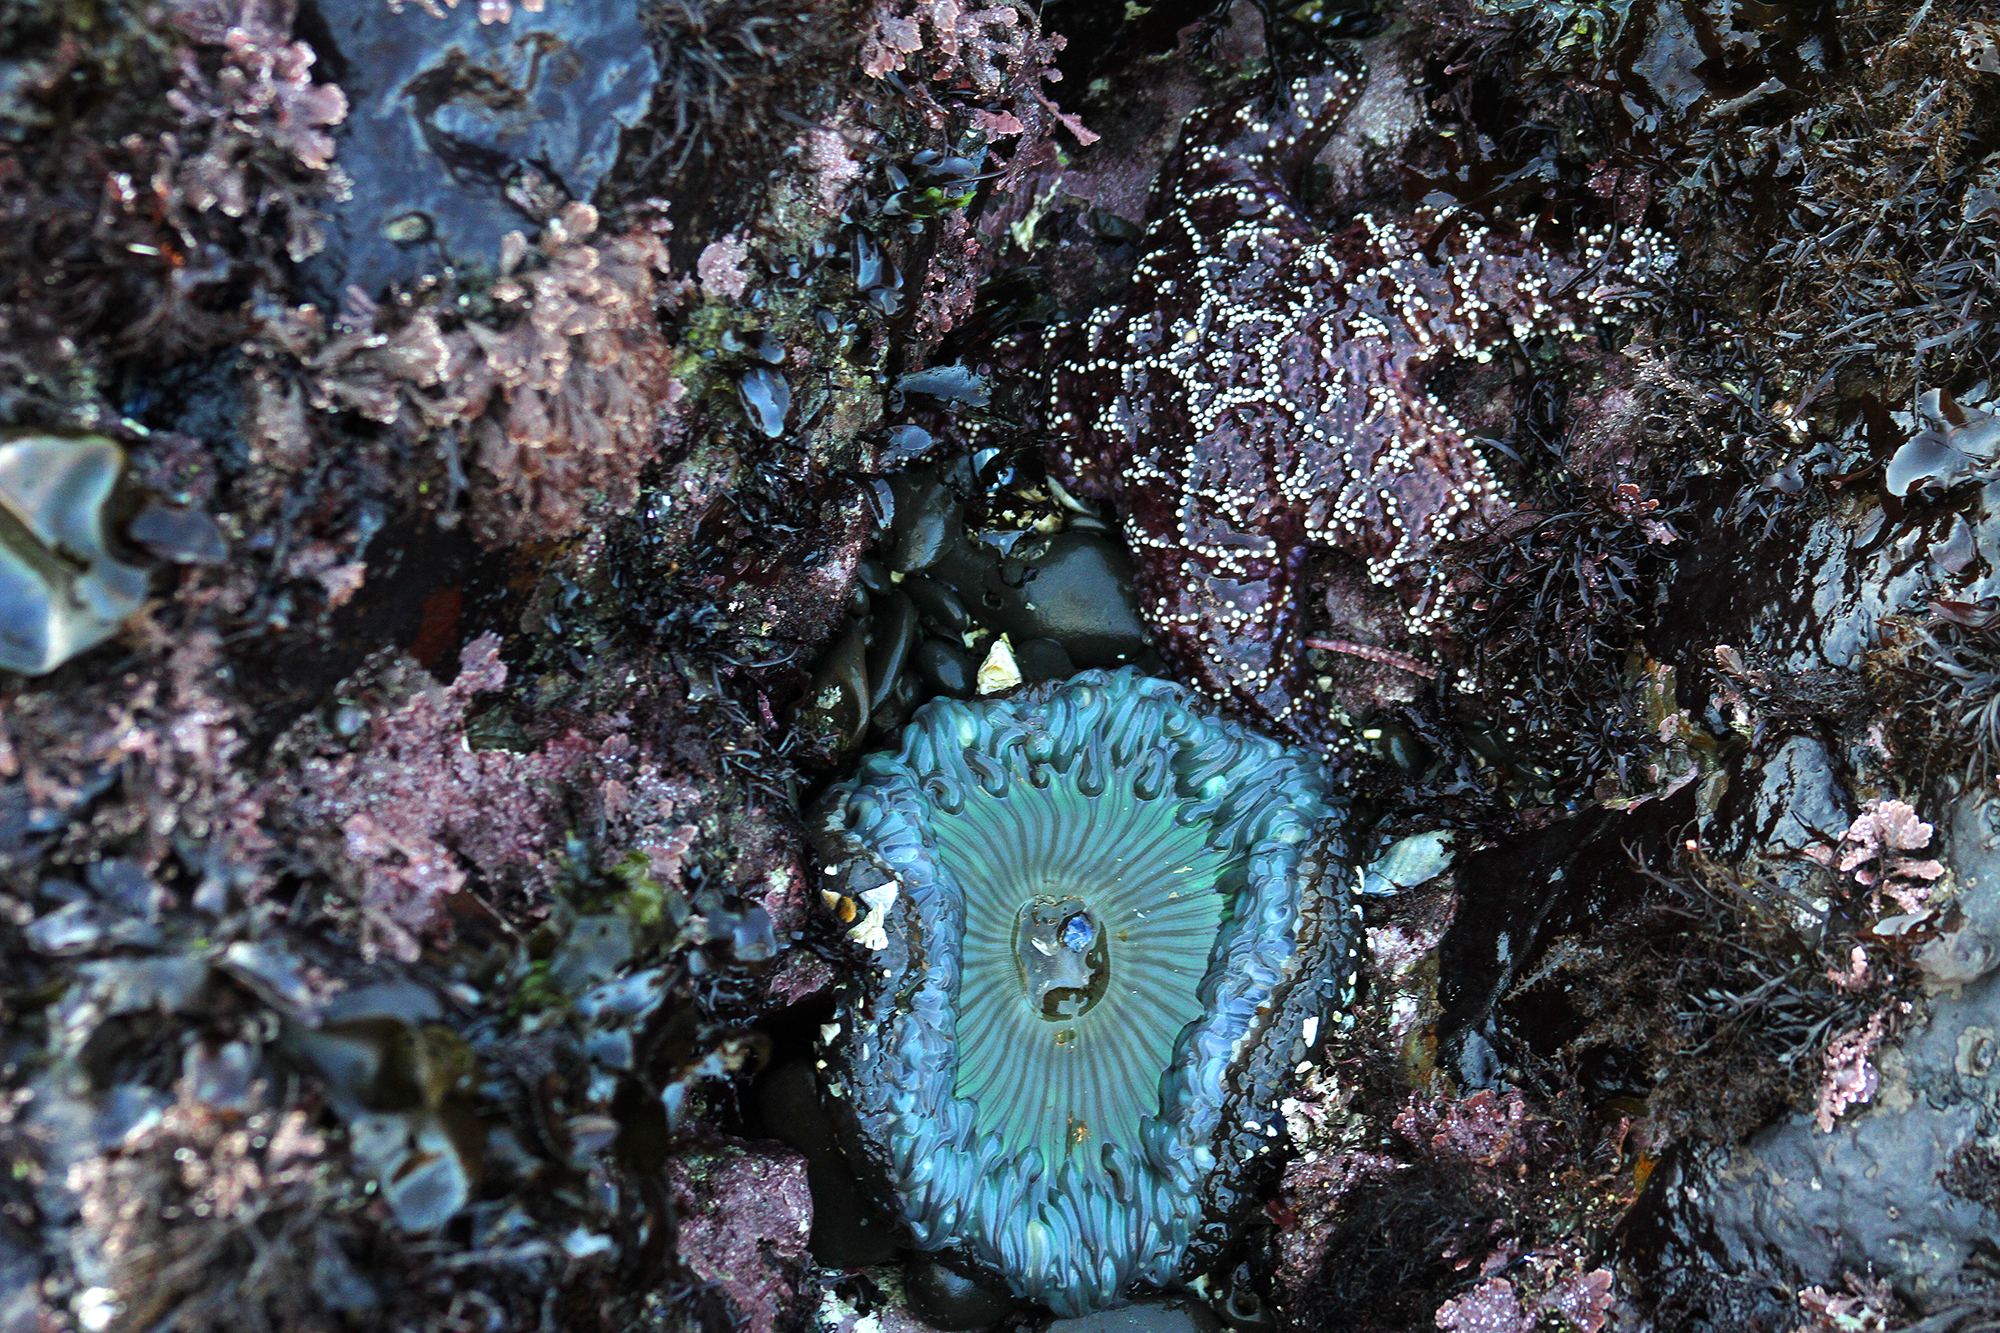 Sea star and sea anemone